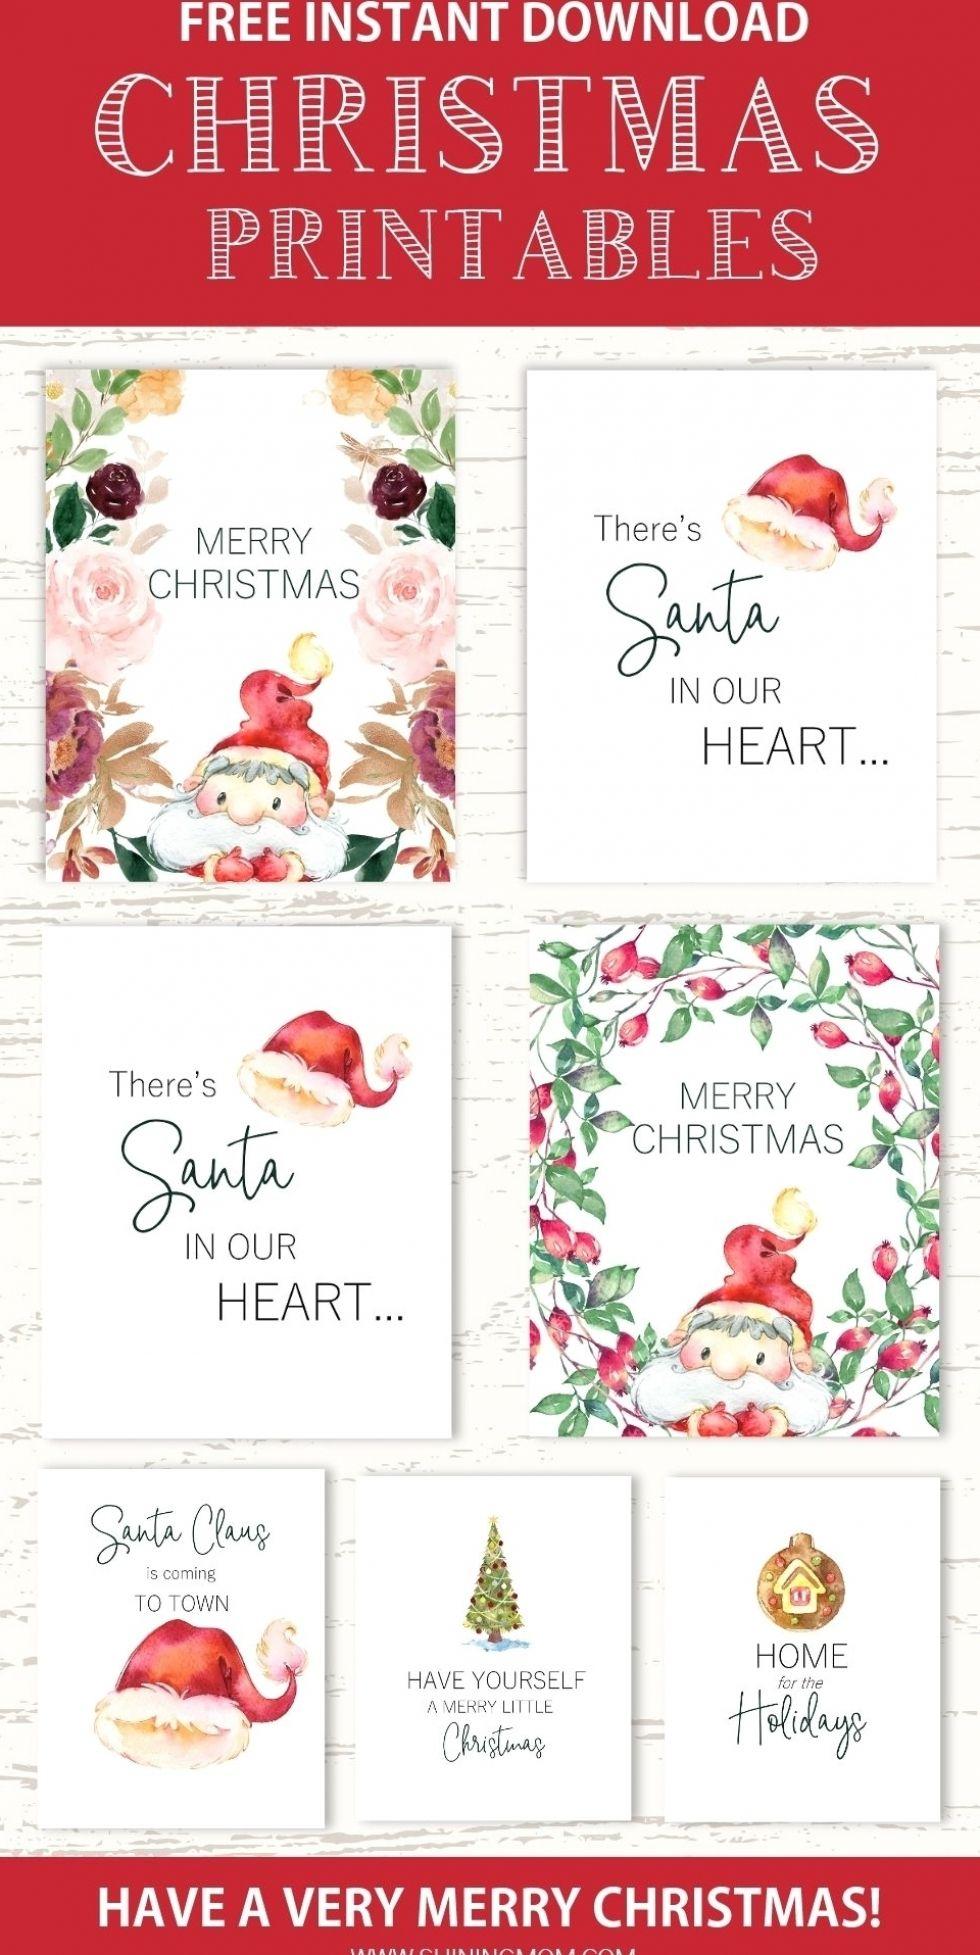 Free Christmas Printables Free Christmas Printables Merry Christmas Printable Christmas Printables